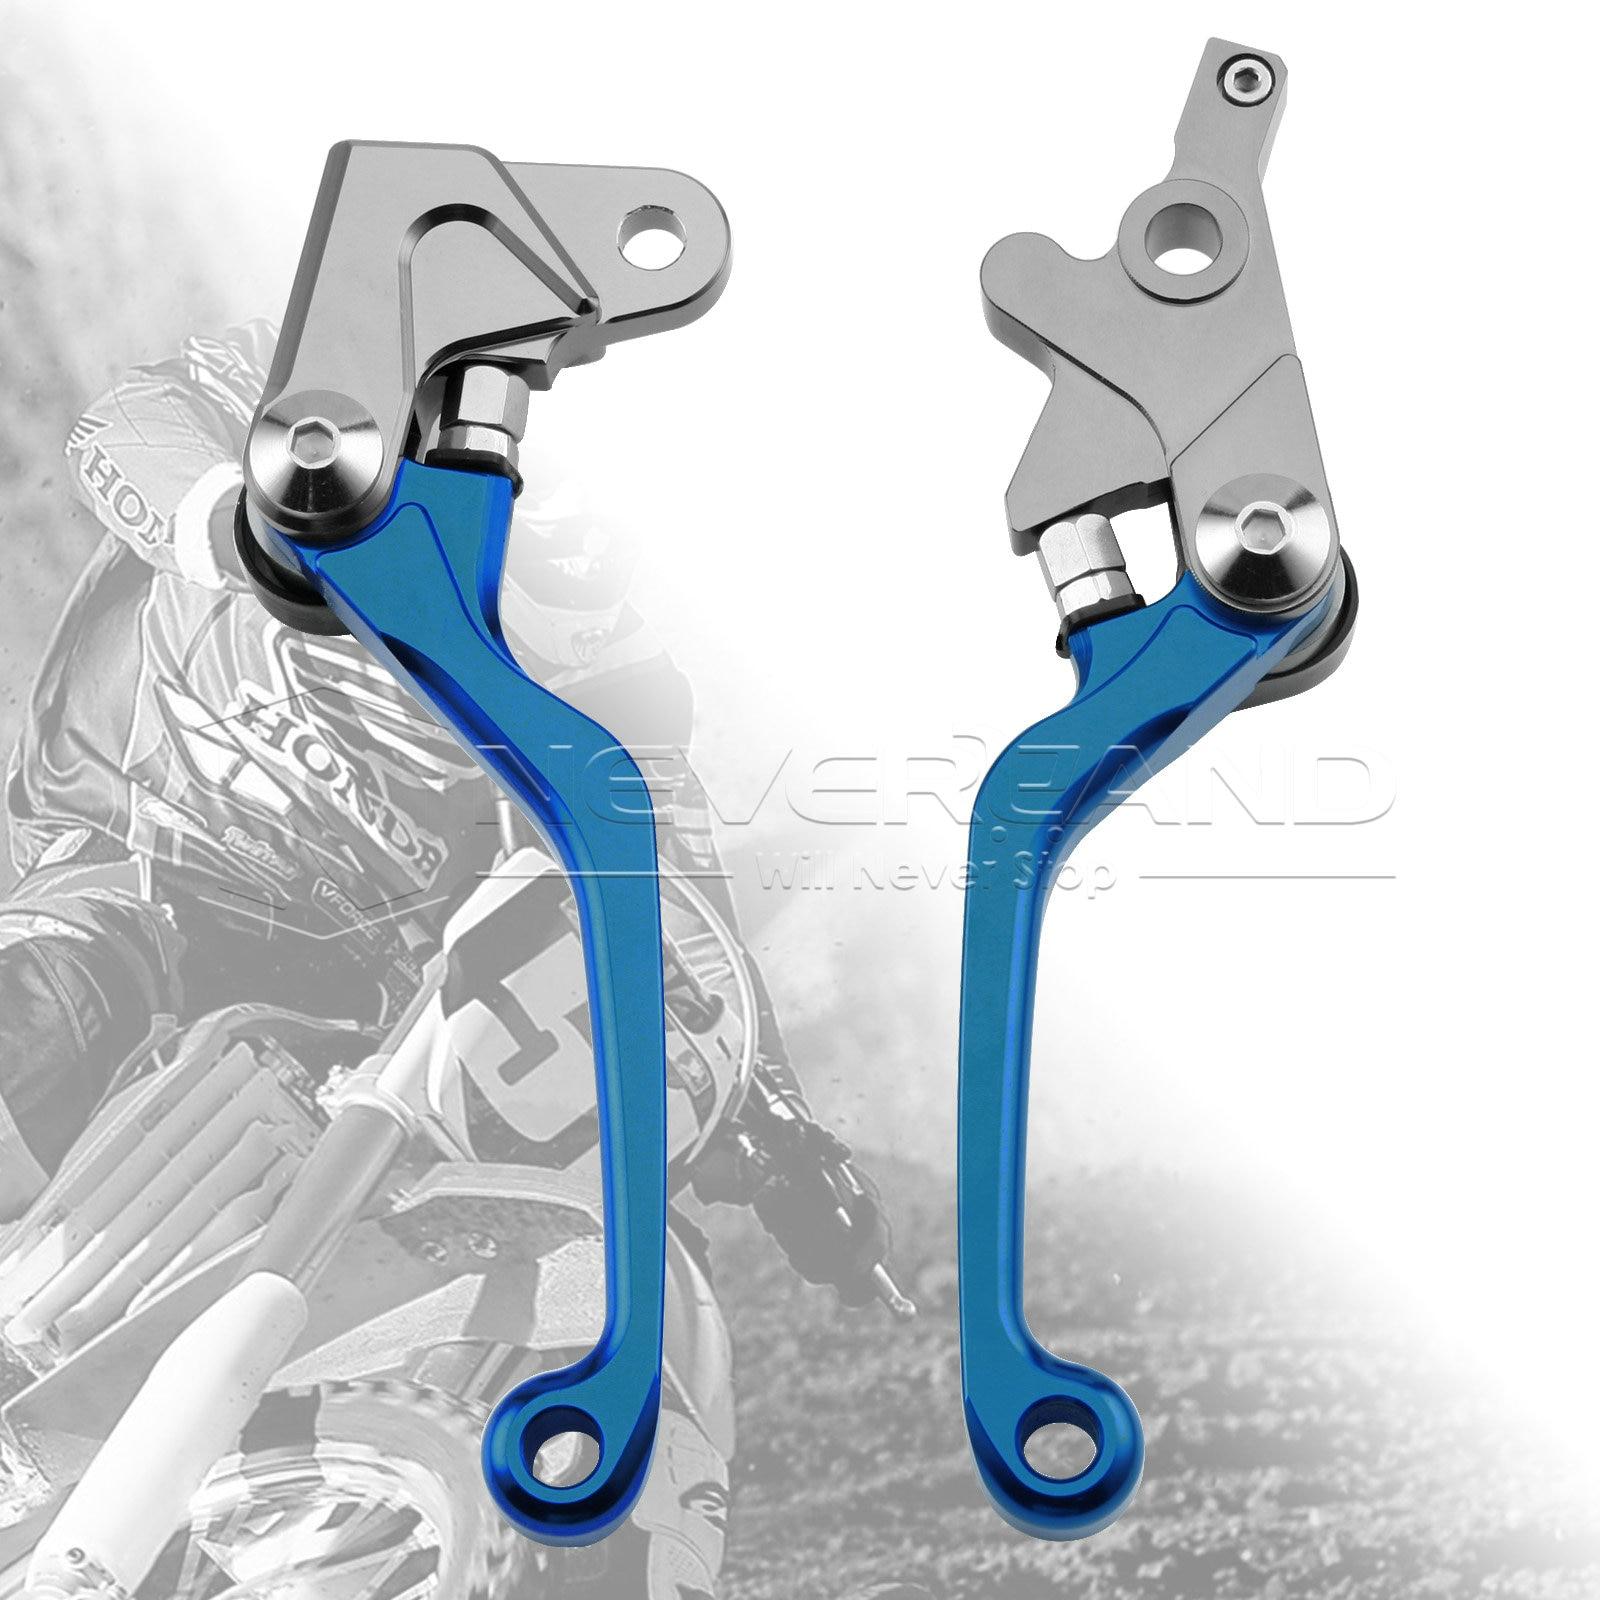 One Pair CNC Pivot Brake Clutch Levers For Honda XR250/MOTARD 95-07 XR400MOTARD 05-08 CRM250R/AR 94-98 L01K/R05K Blue D10 cnc dirt bike flex pivot brake clutch levers for honda crm250r ar xr250 400 motard